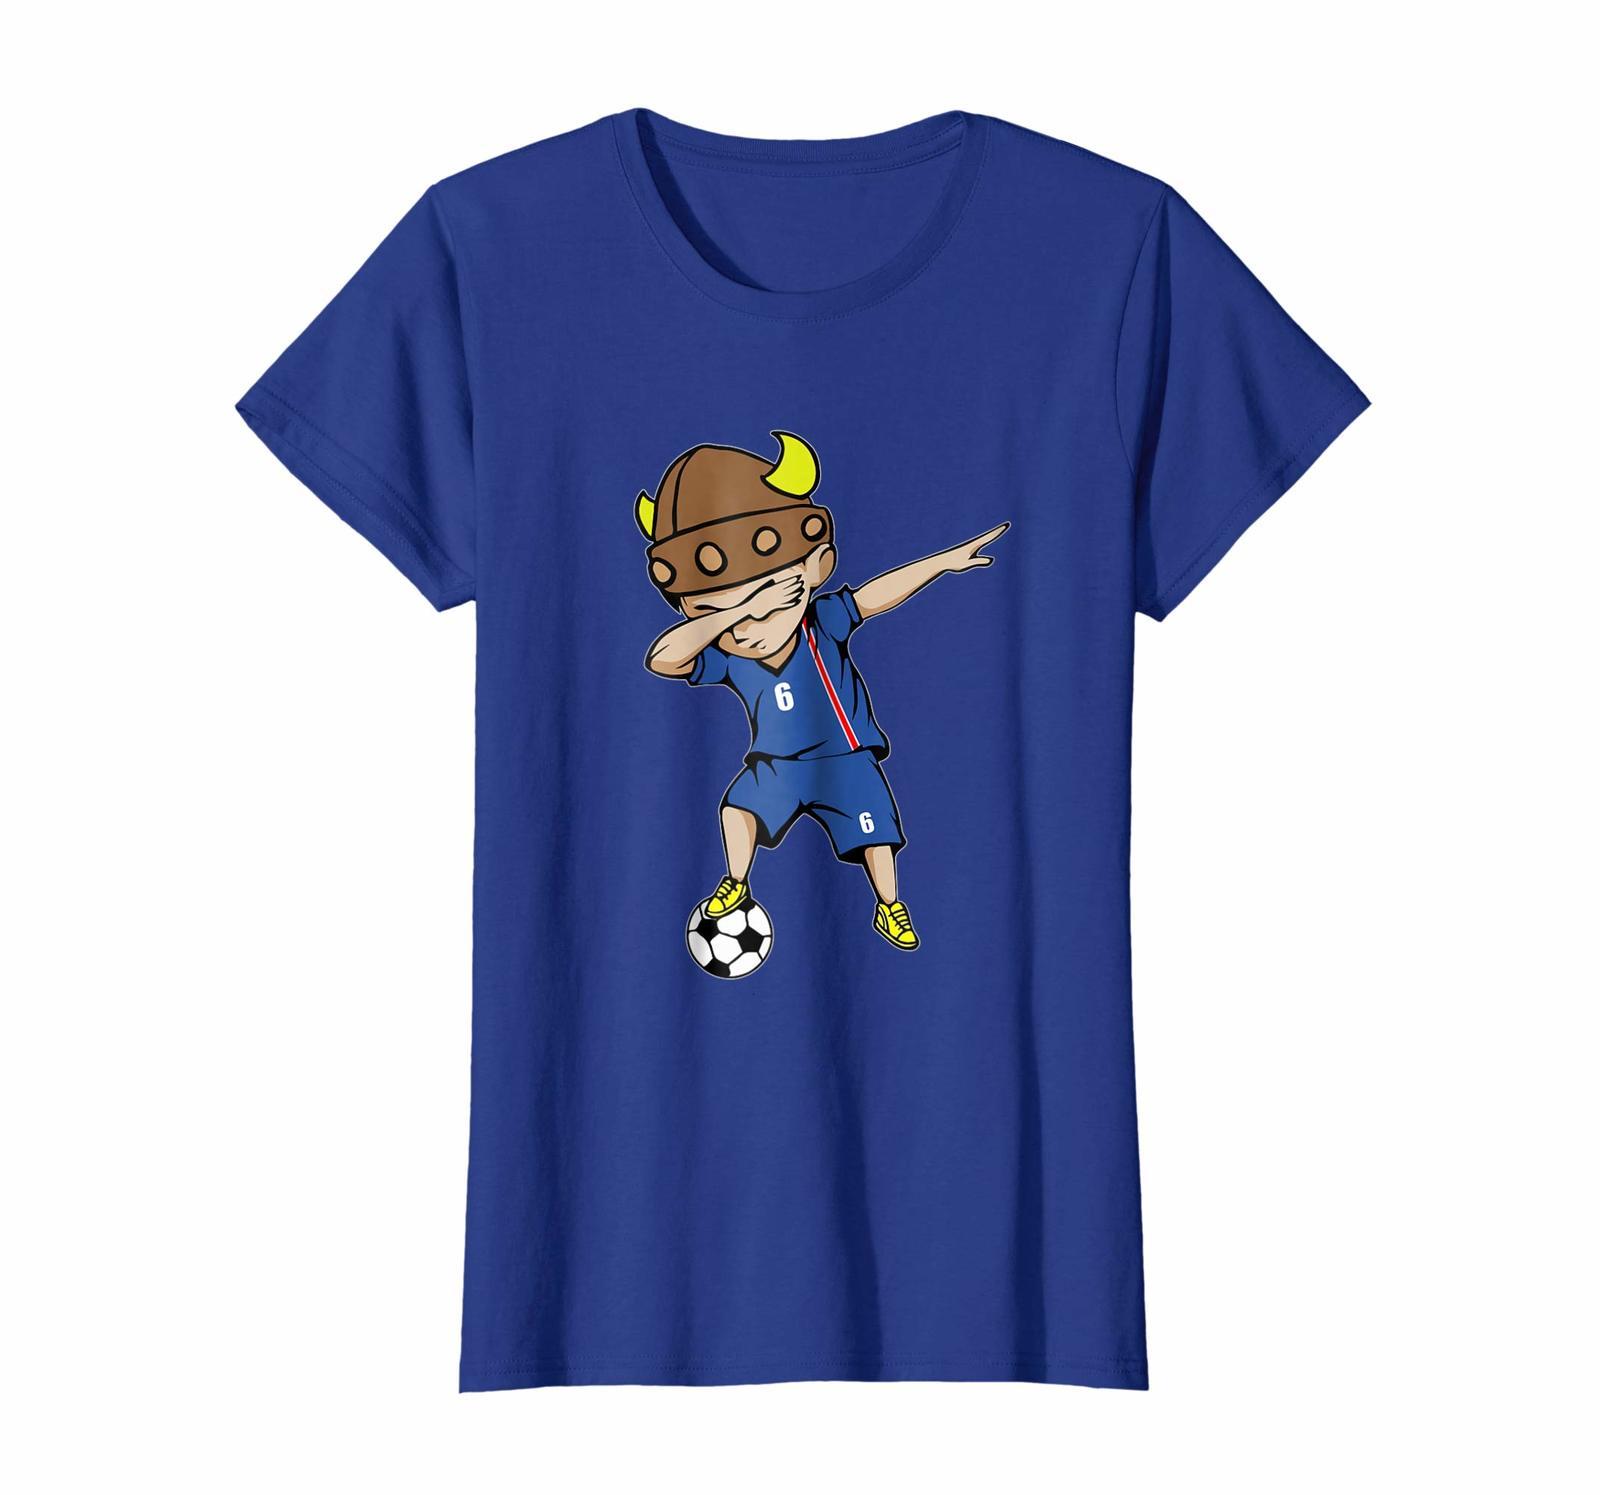 Sport Shirts - Dabbing Soccer Boy Iceland Jersey T-Shirt - Number 6 Tees Wowen